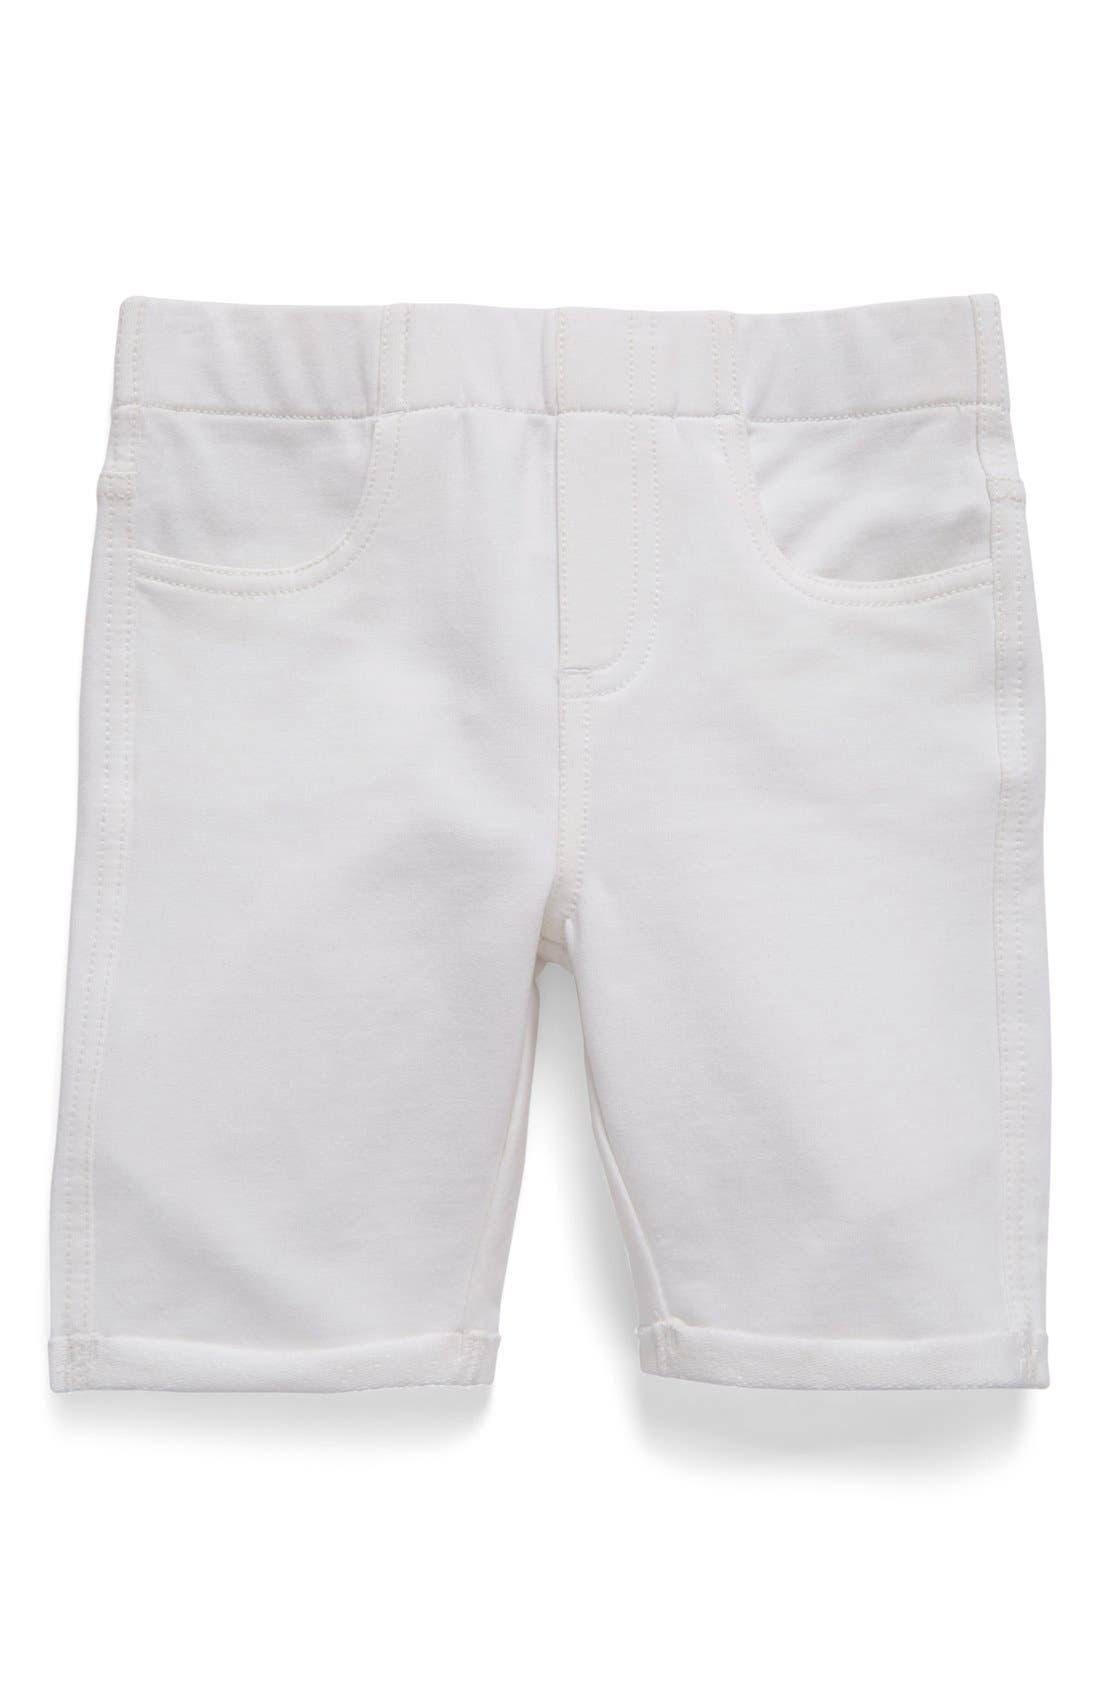 TUCKER + TATE 'Jenna' Jegging Shorts, Main, color, WHITE